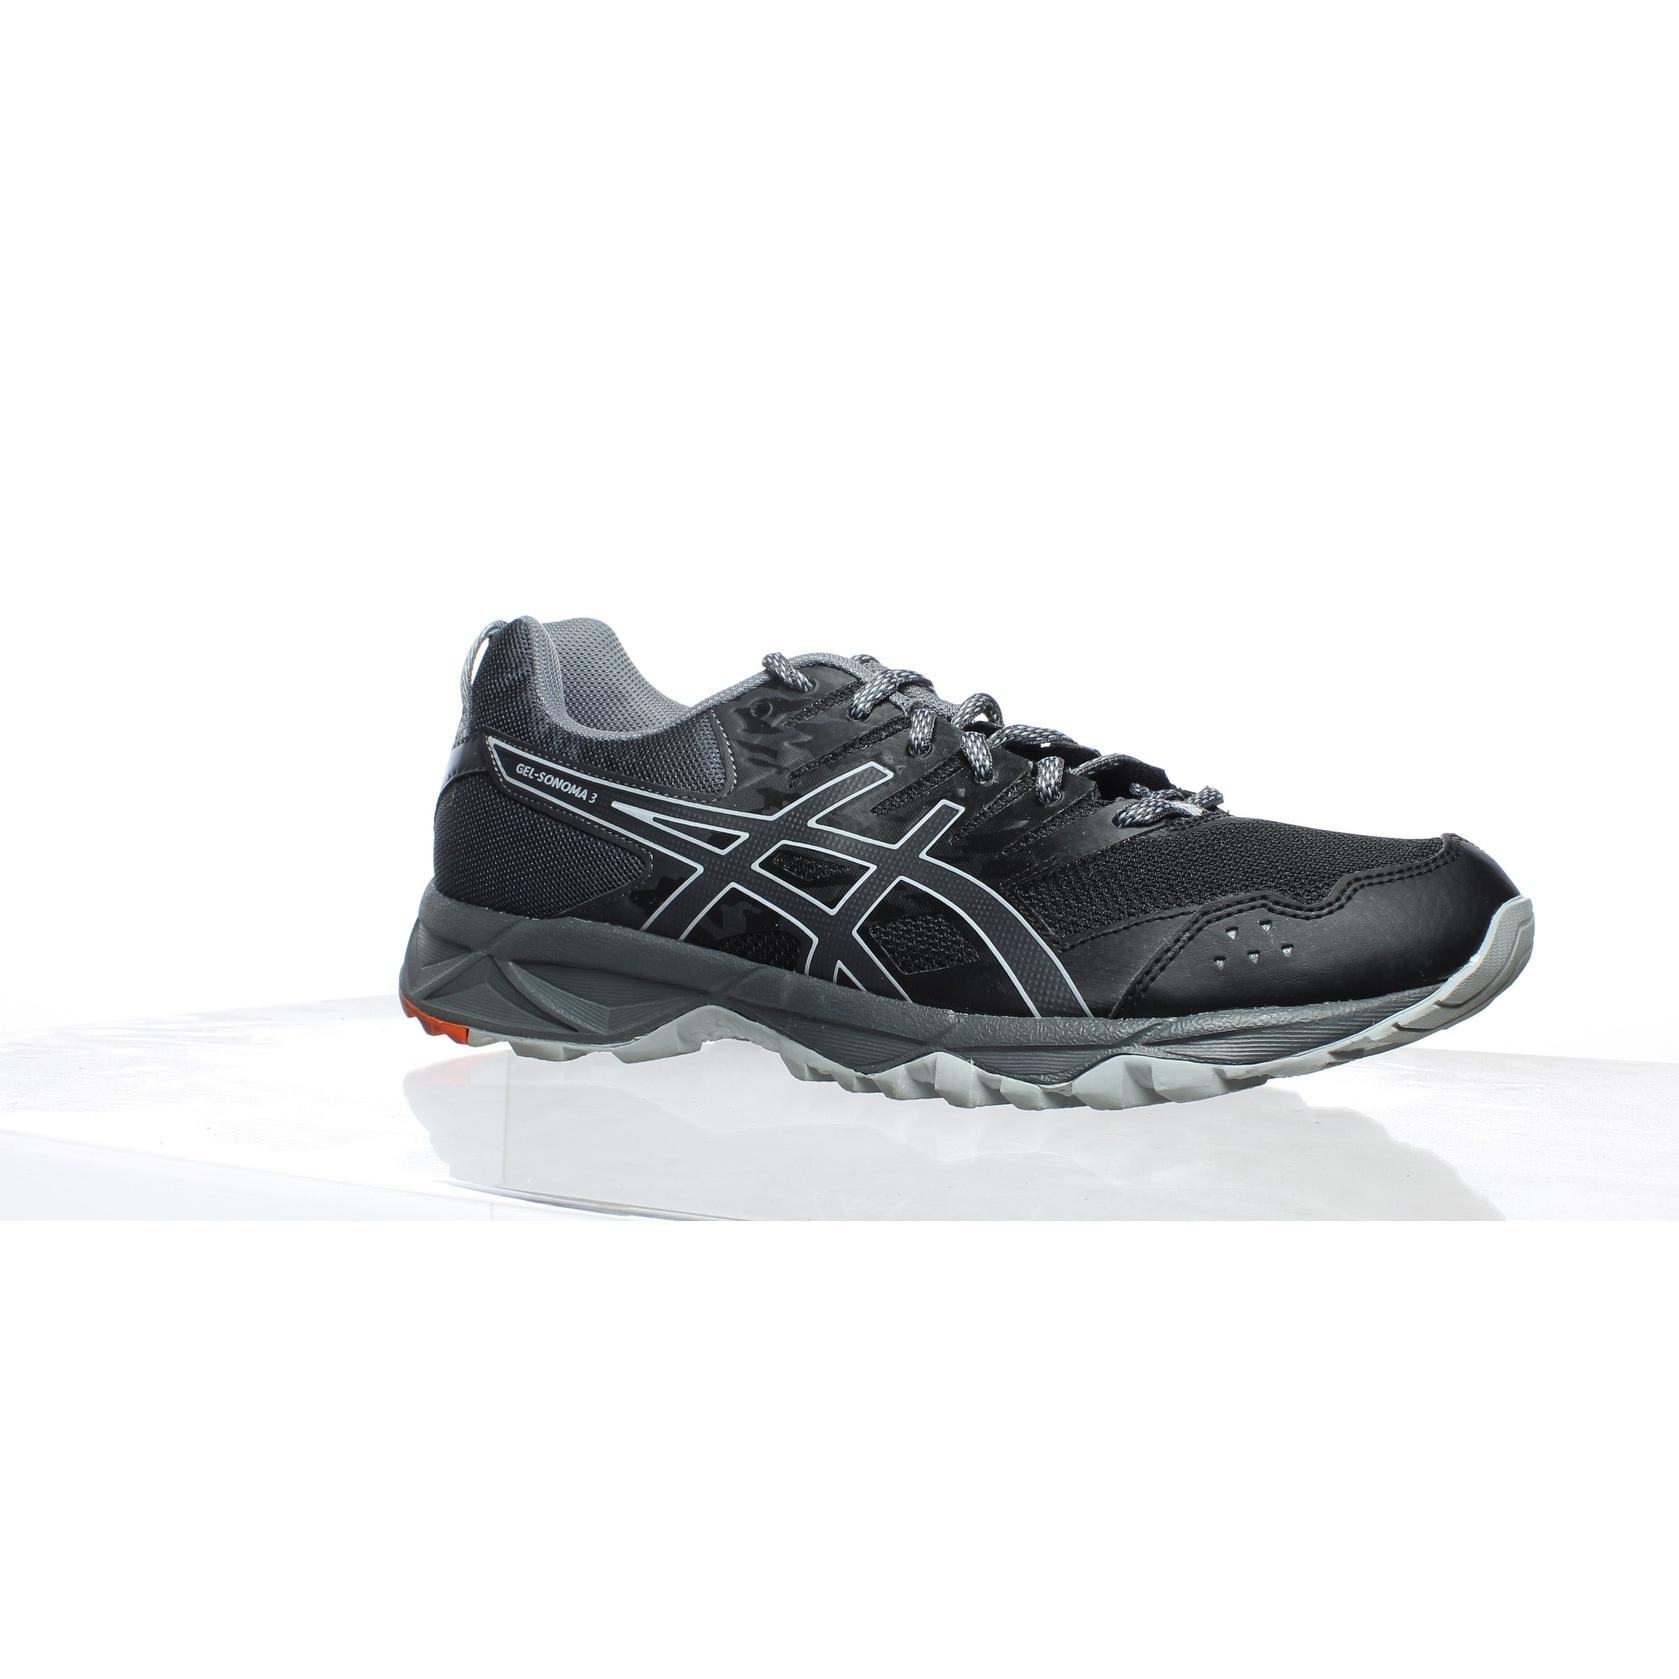 ASICS Womens Gel Sonoma 3 BlackDark Grey Running Shoes Size 11